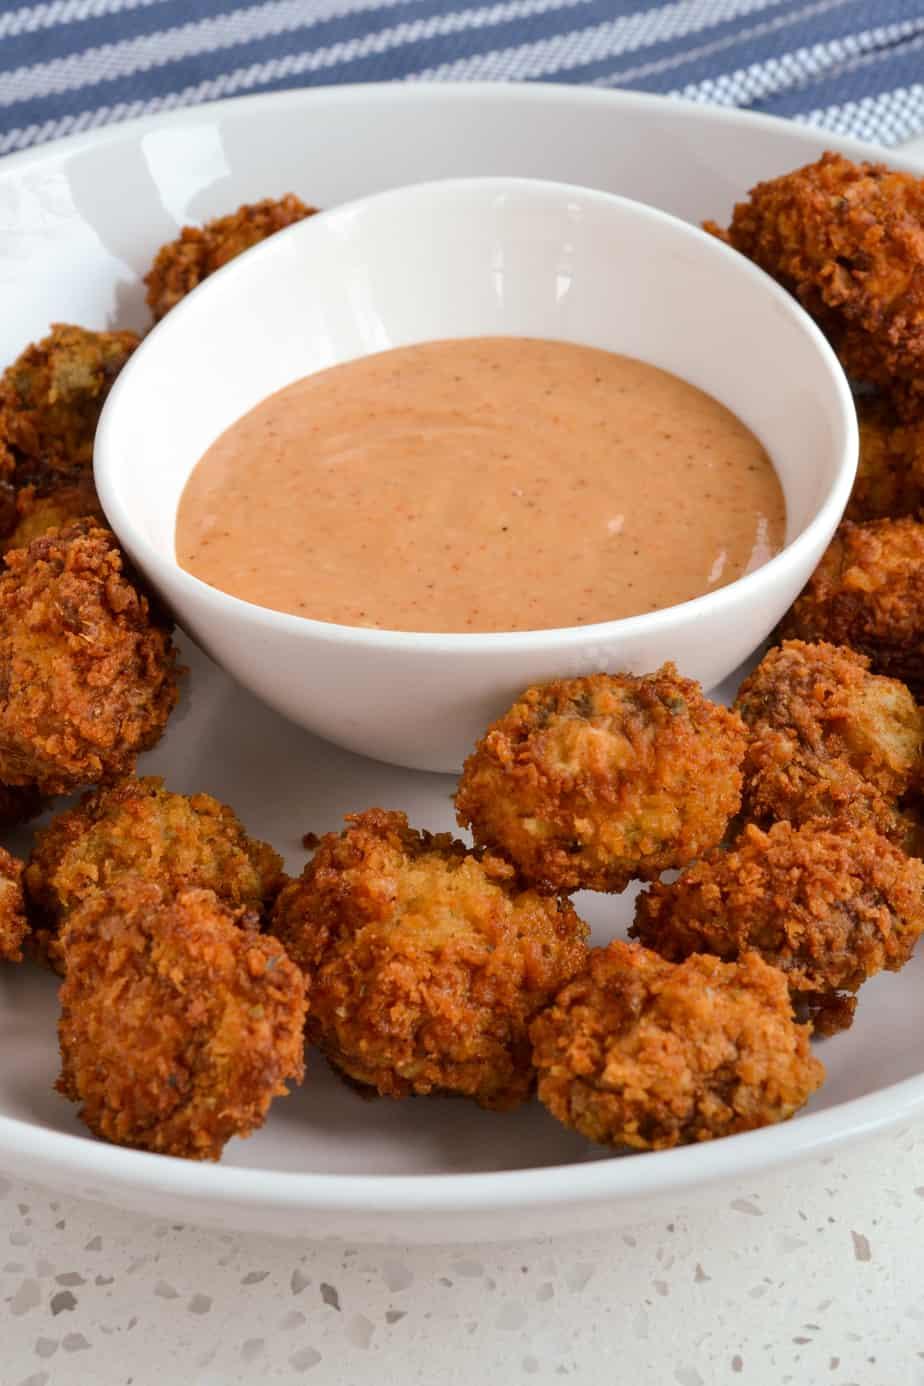 Golden fried panko breaded mushrooms